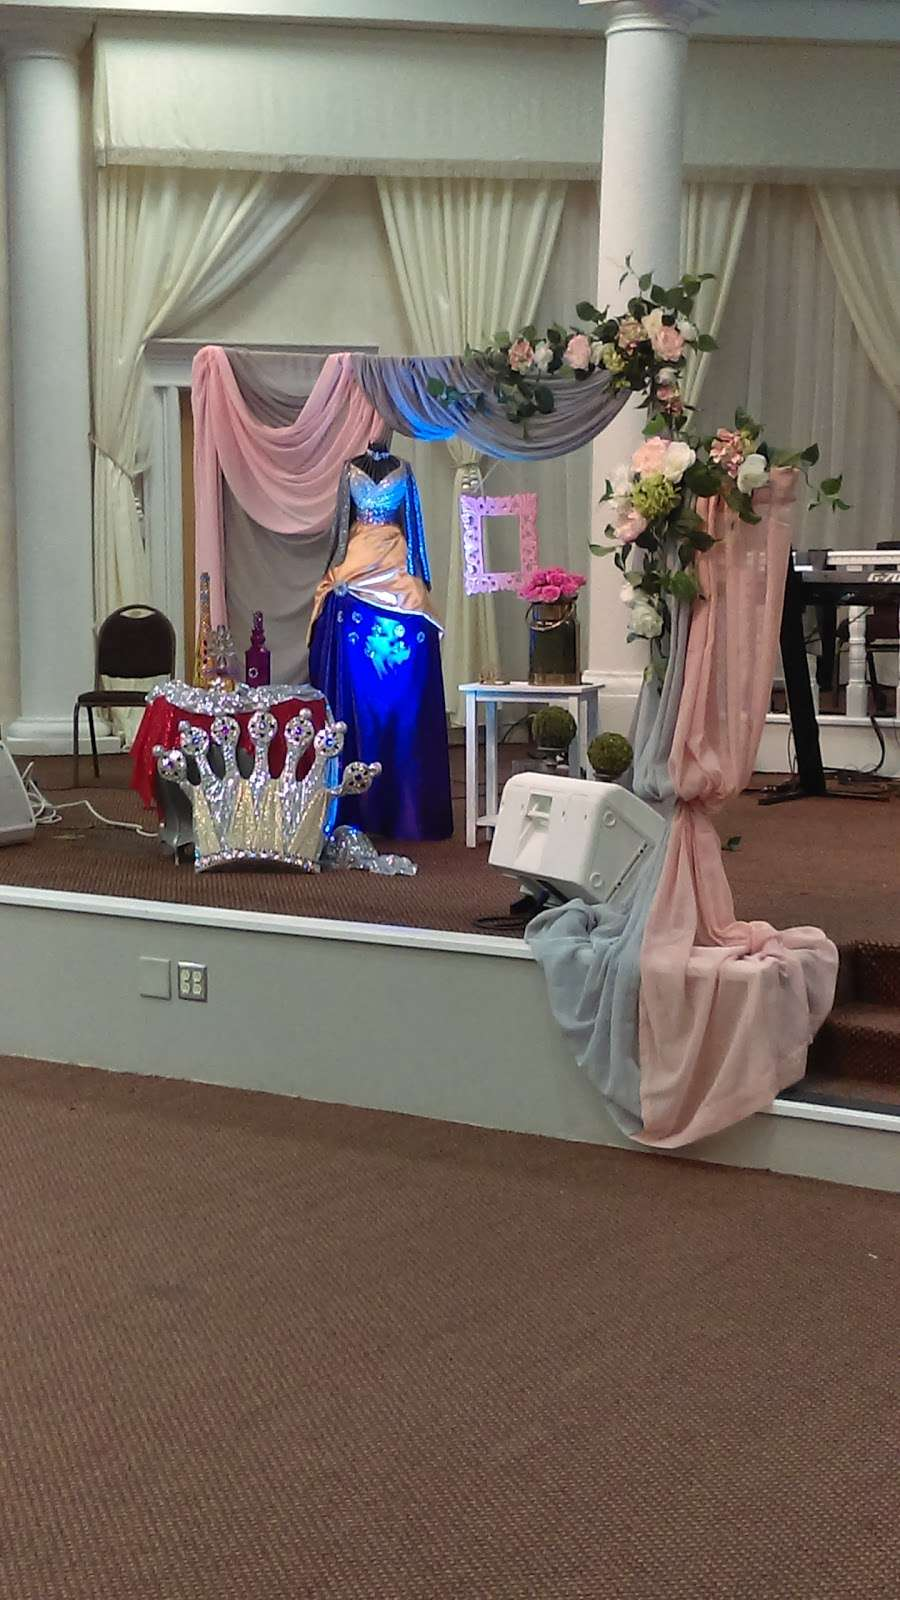 Iglesia de DIOS Pentecostal Movimiento internacional - church  | Photo 2 of 6 | Address: 3225 S Goldenrod Rd, Orlando, FL 32822, USA